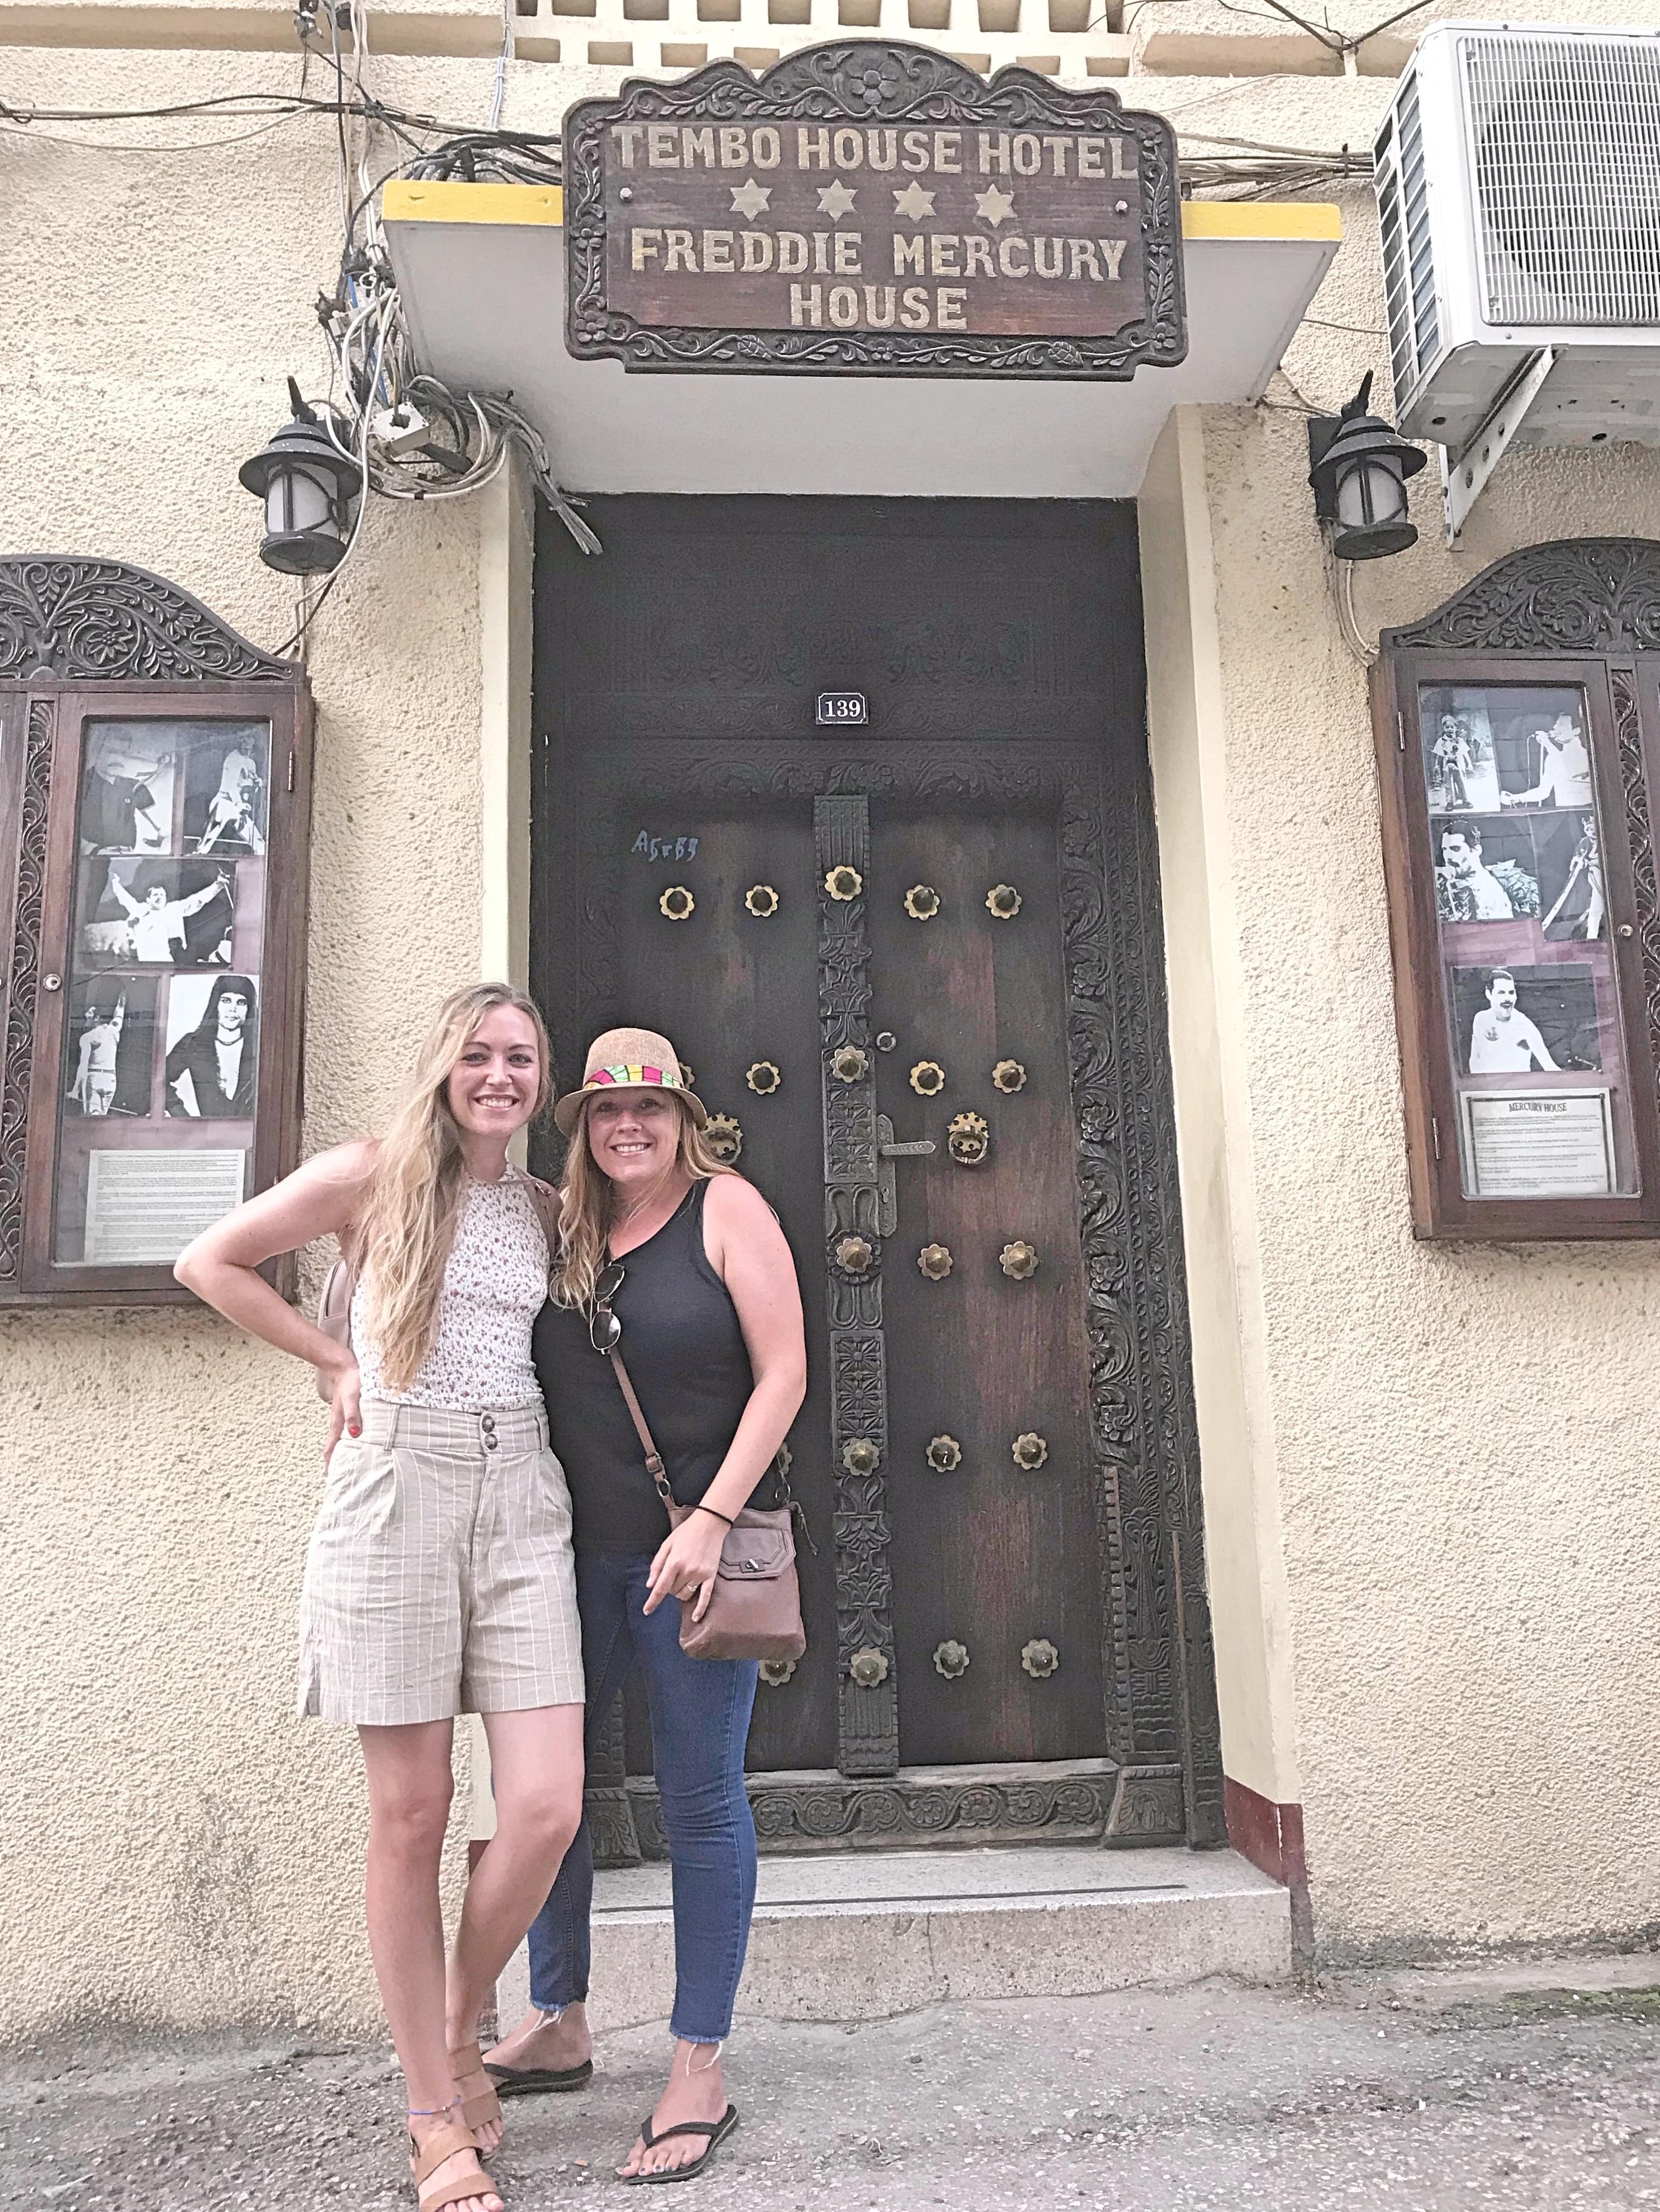 Freddie Mercury's House Stone Town Zanzibar